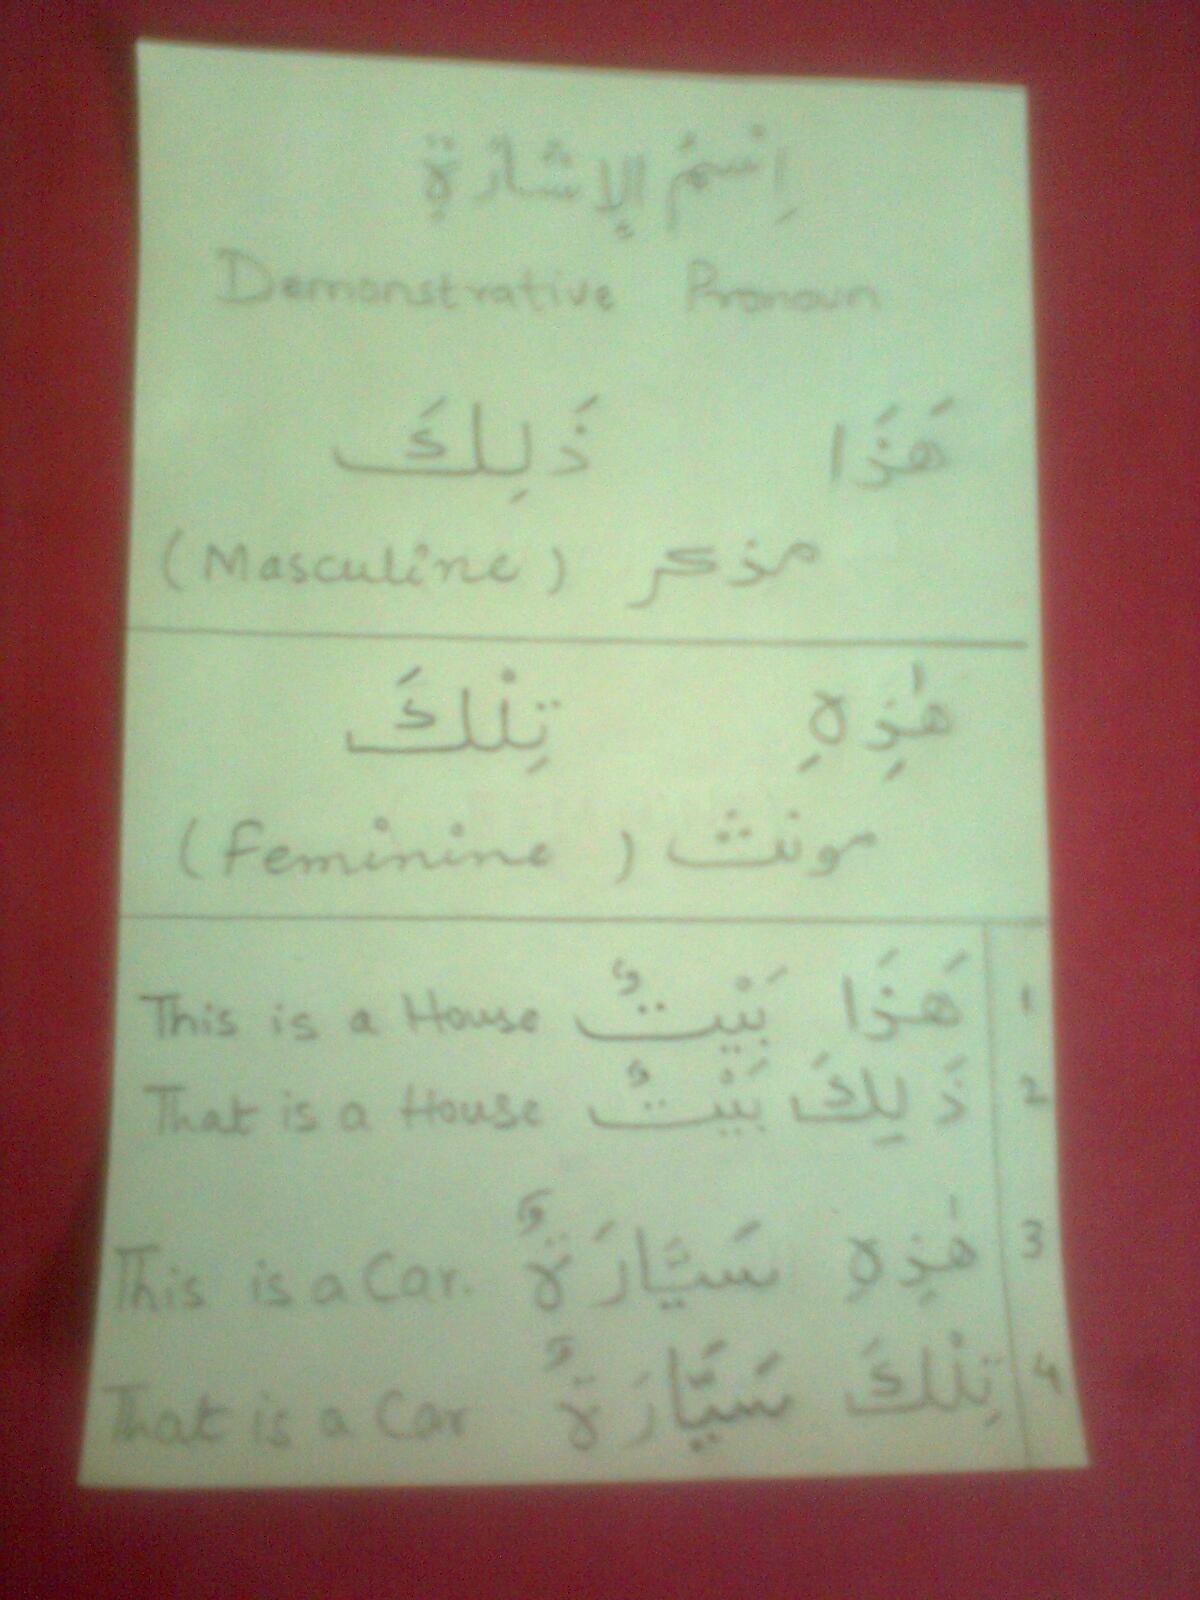 Learn Arabic: Part#7 ISM-UL-ISHARA ( Demonstrative Pronouns) [ 1600 x 1200 Pixel ]